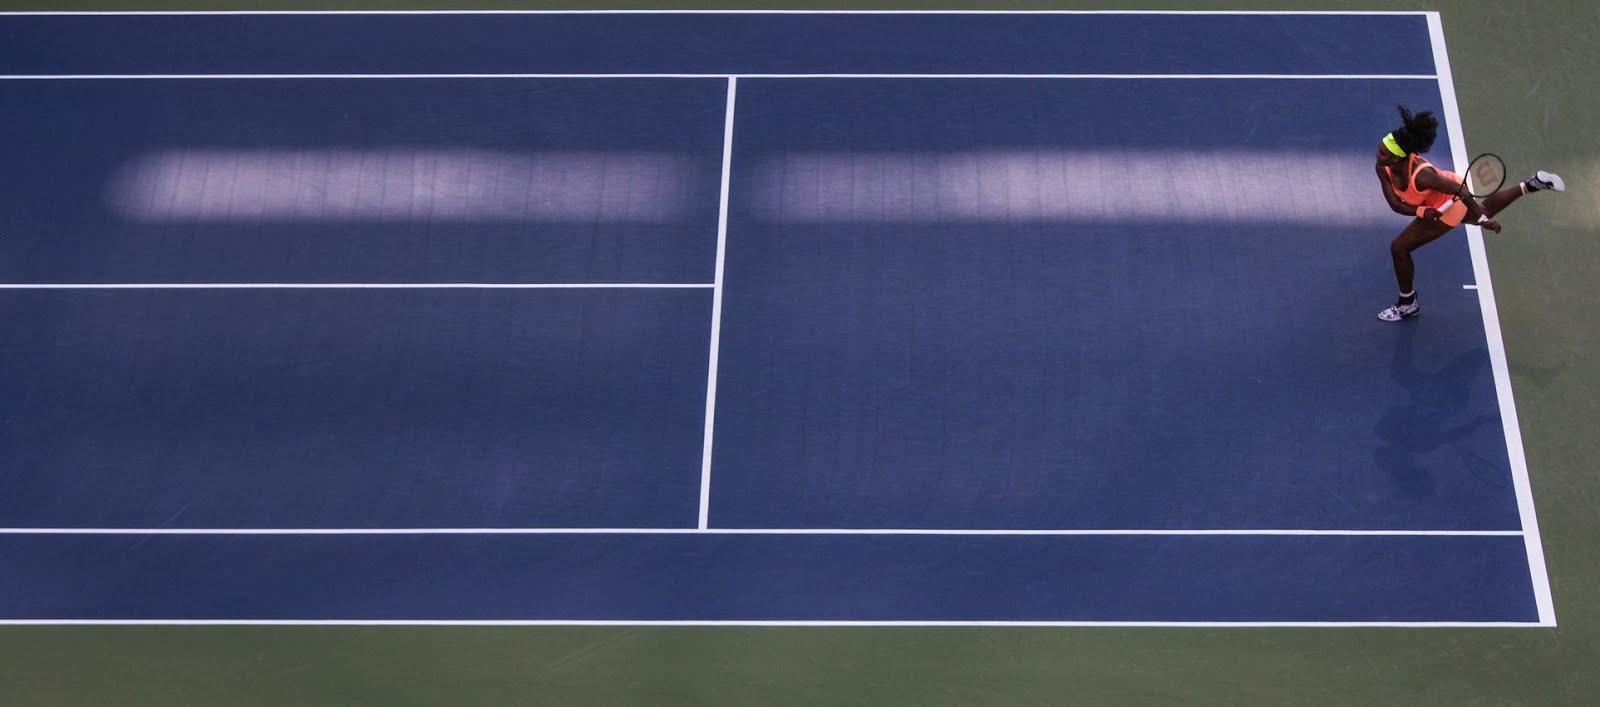 Tennis - Grand Slam - ATP - WTA